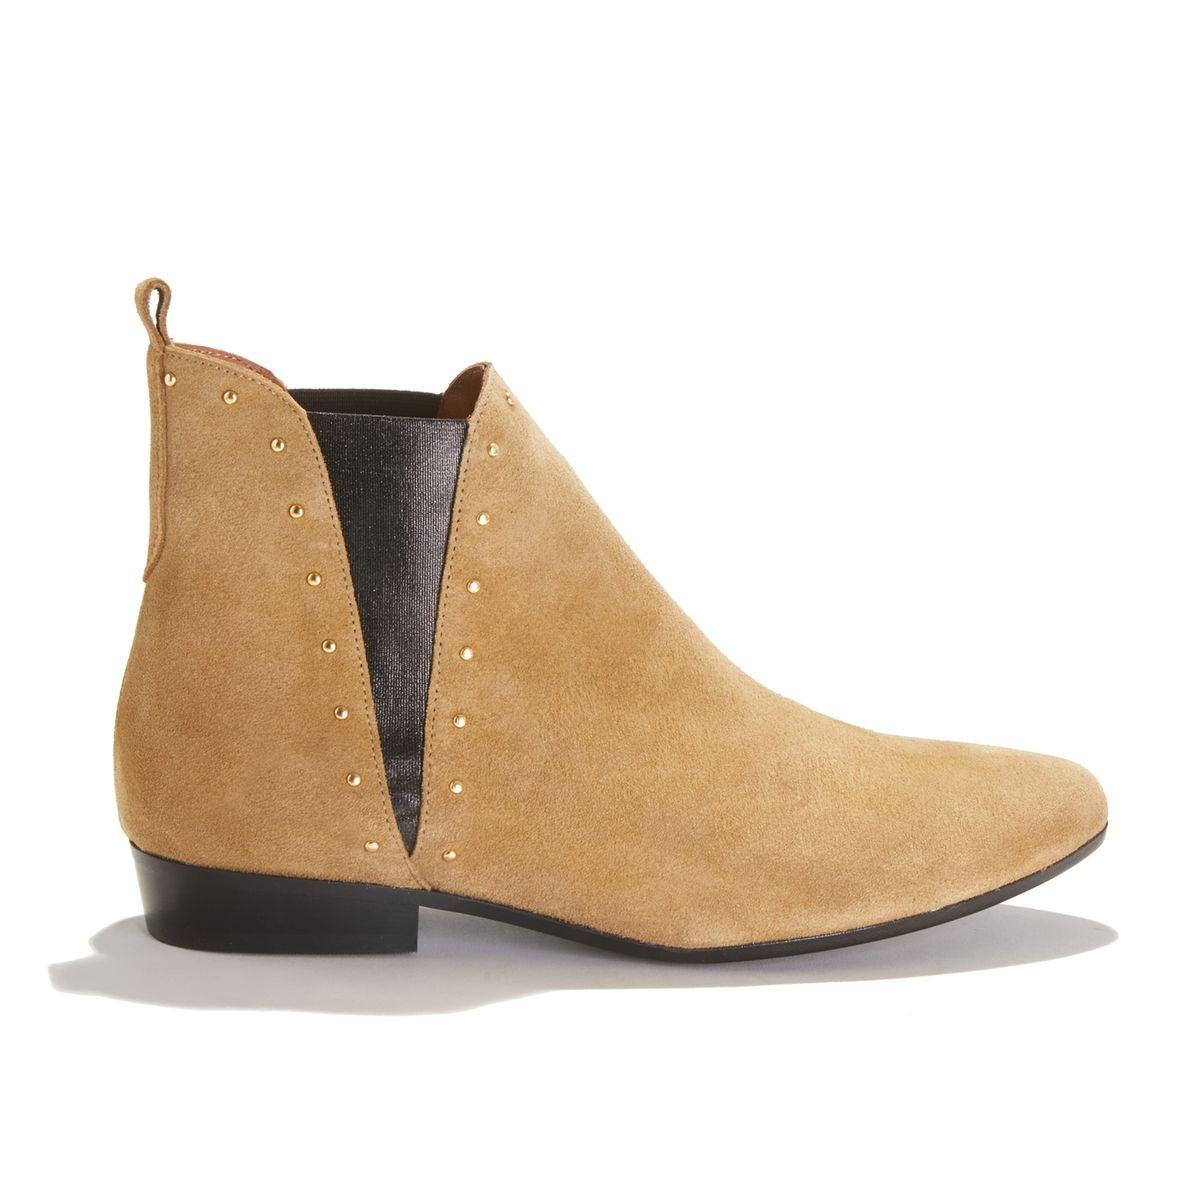 Boots en cuir RITA STUDS SUEDE CALF